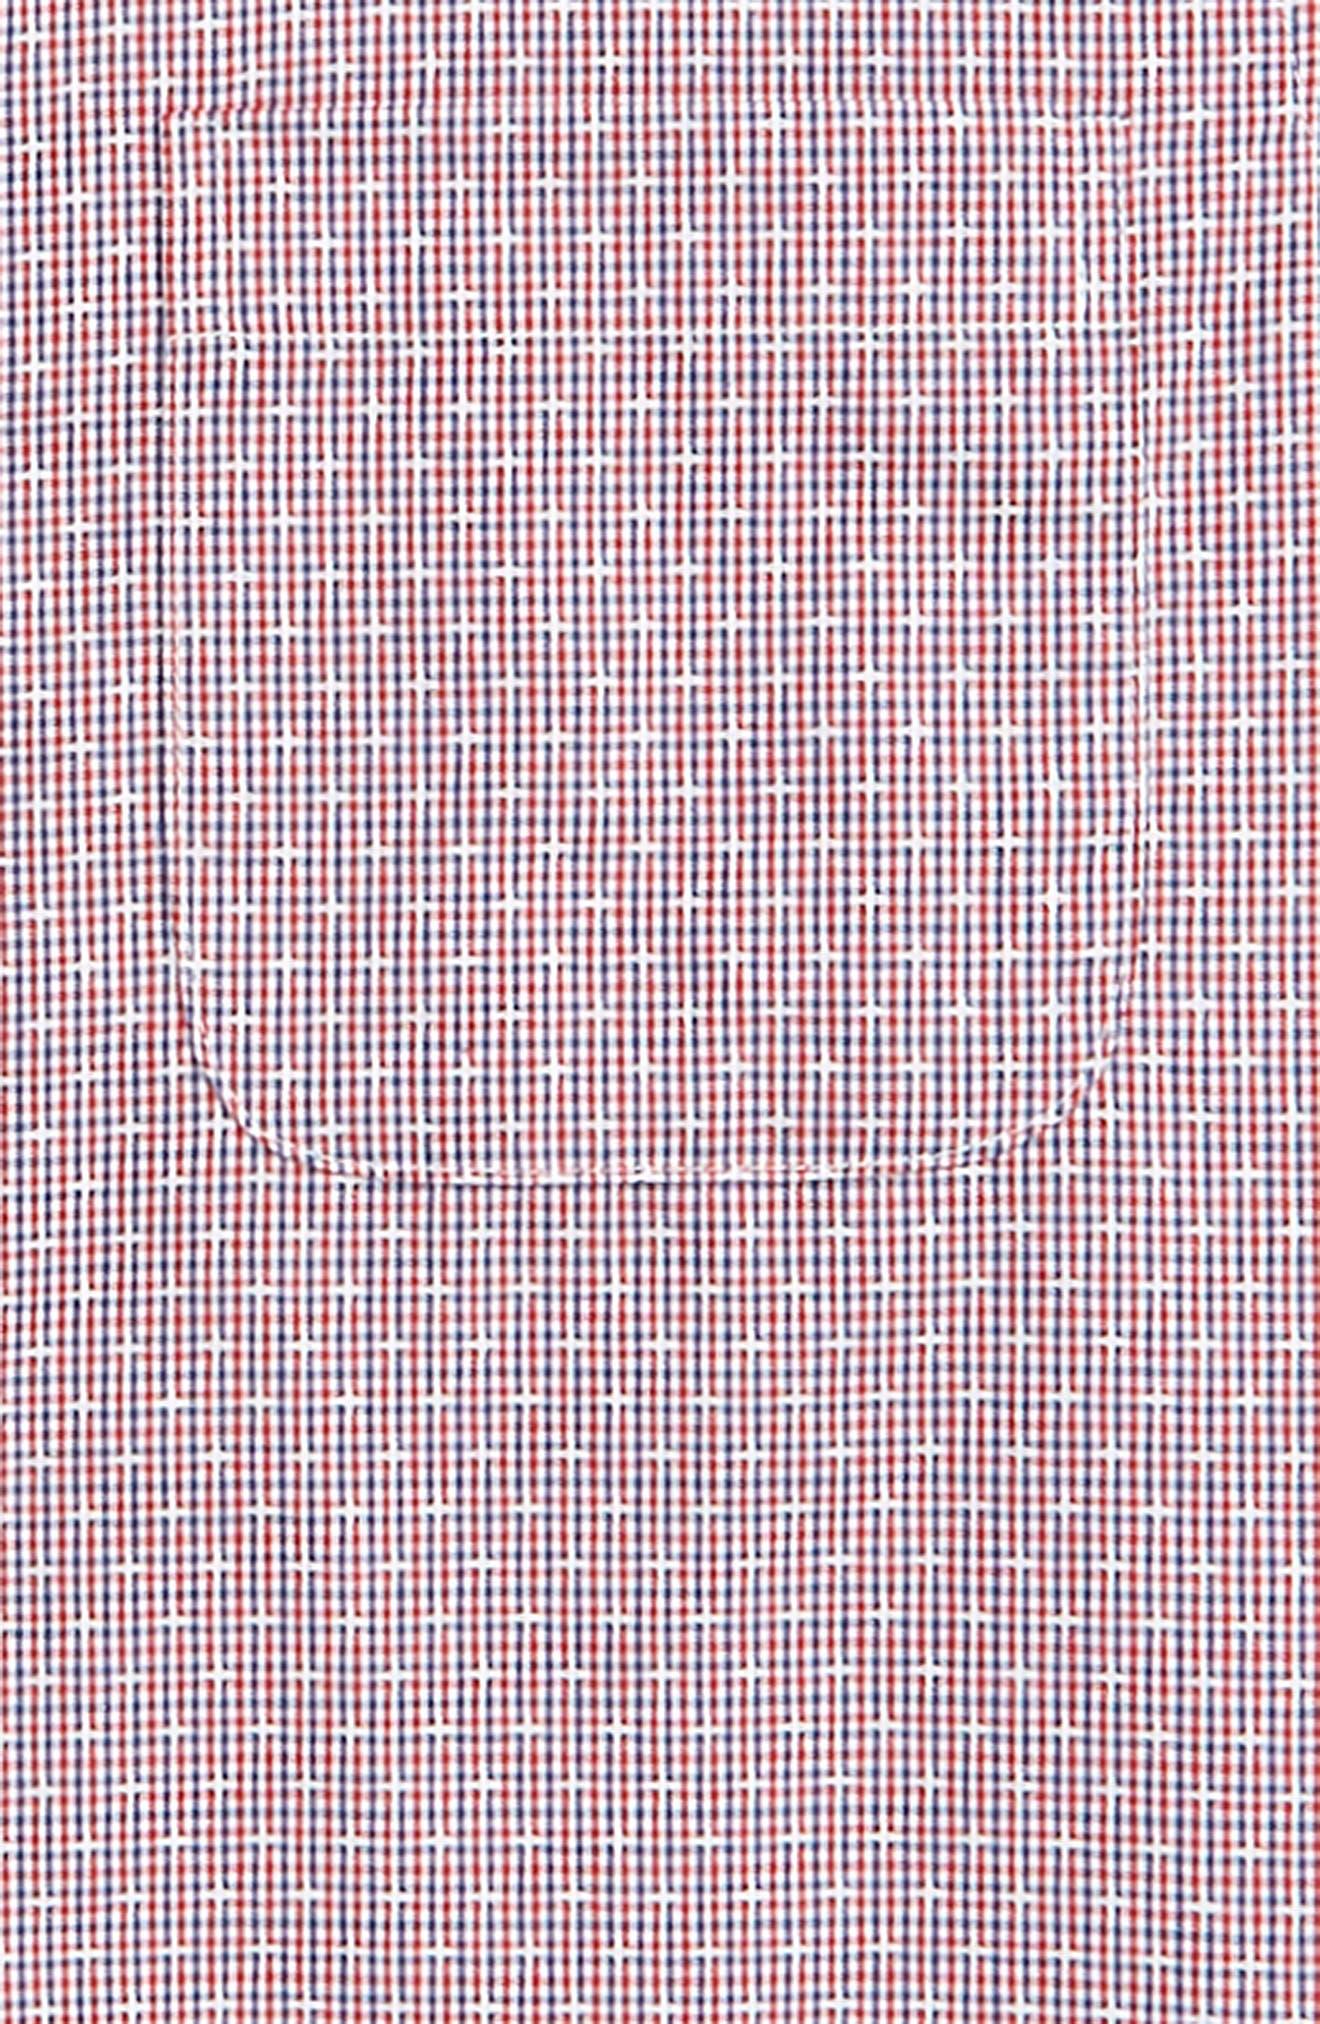 Check Dress Shirt,                             Alternate thumbnail 2, color,                             601